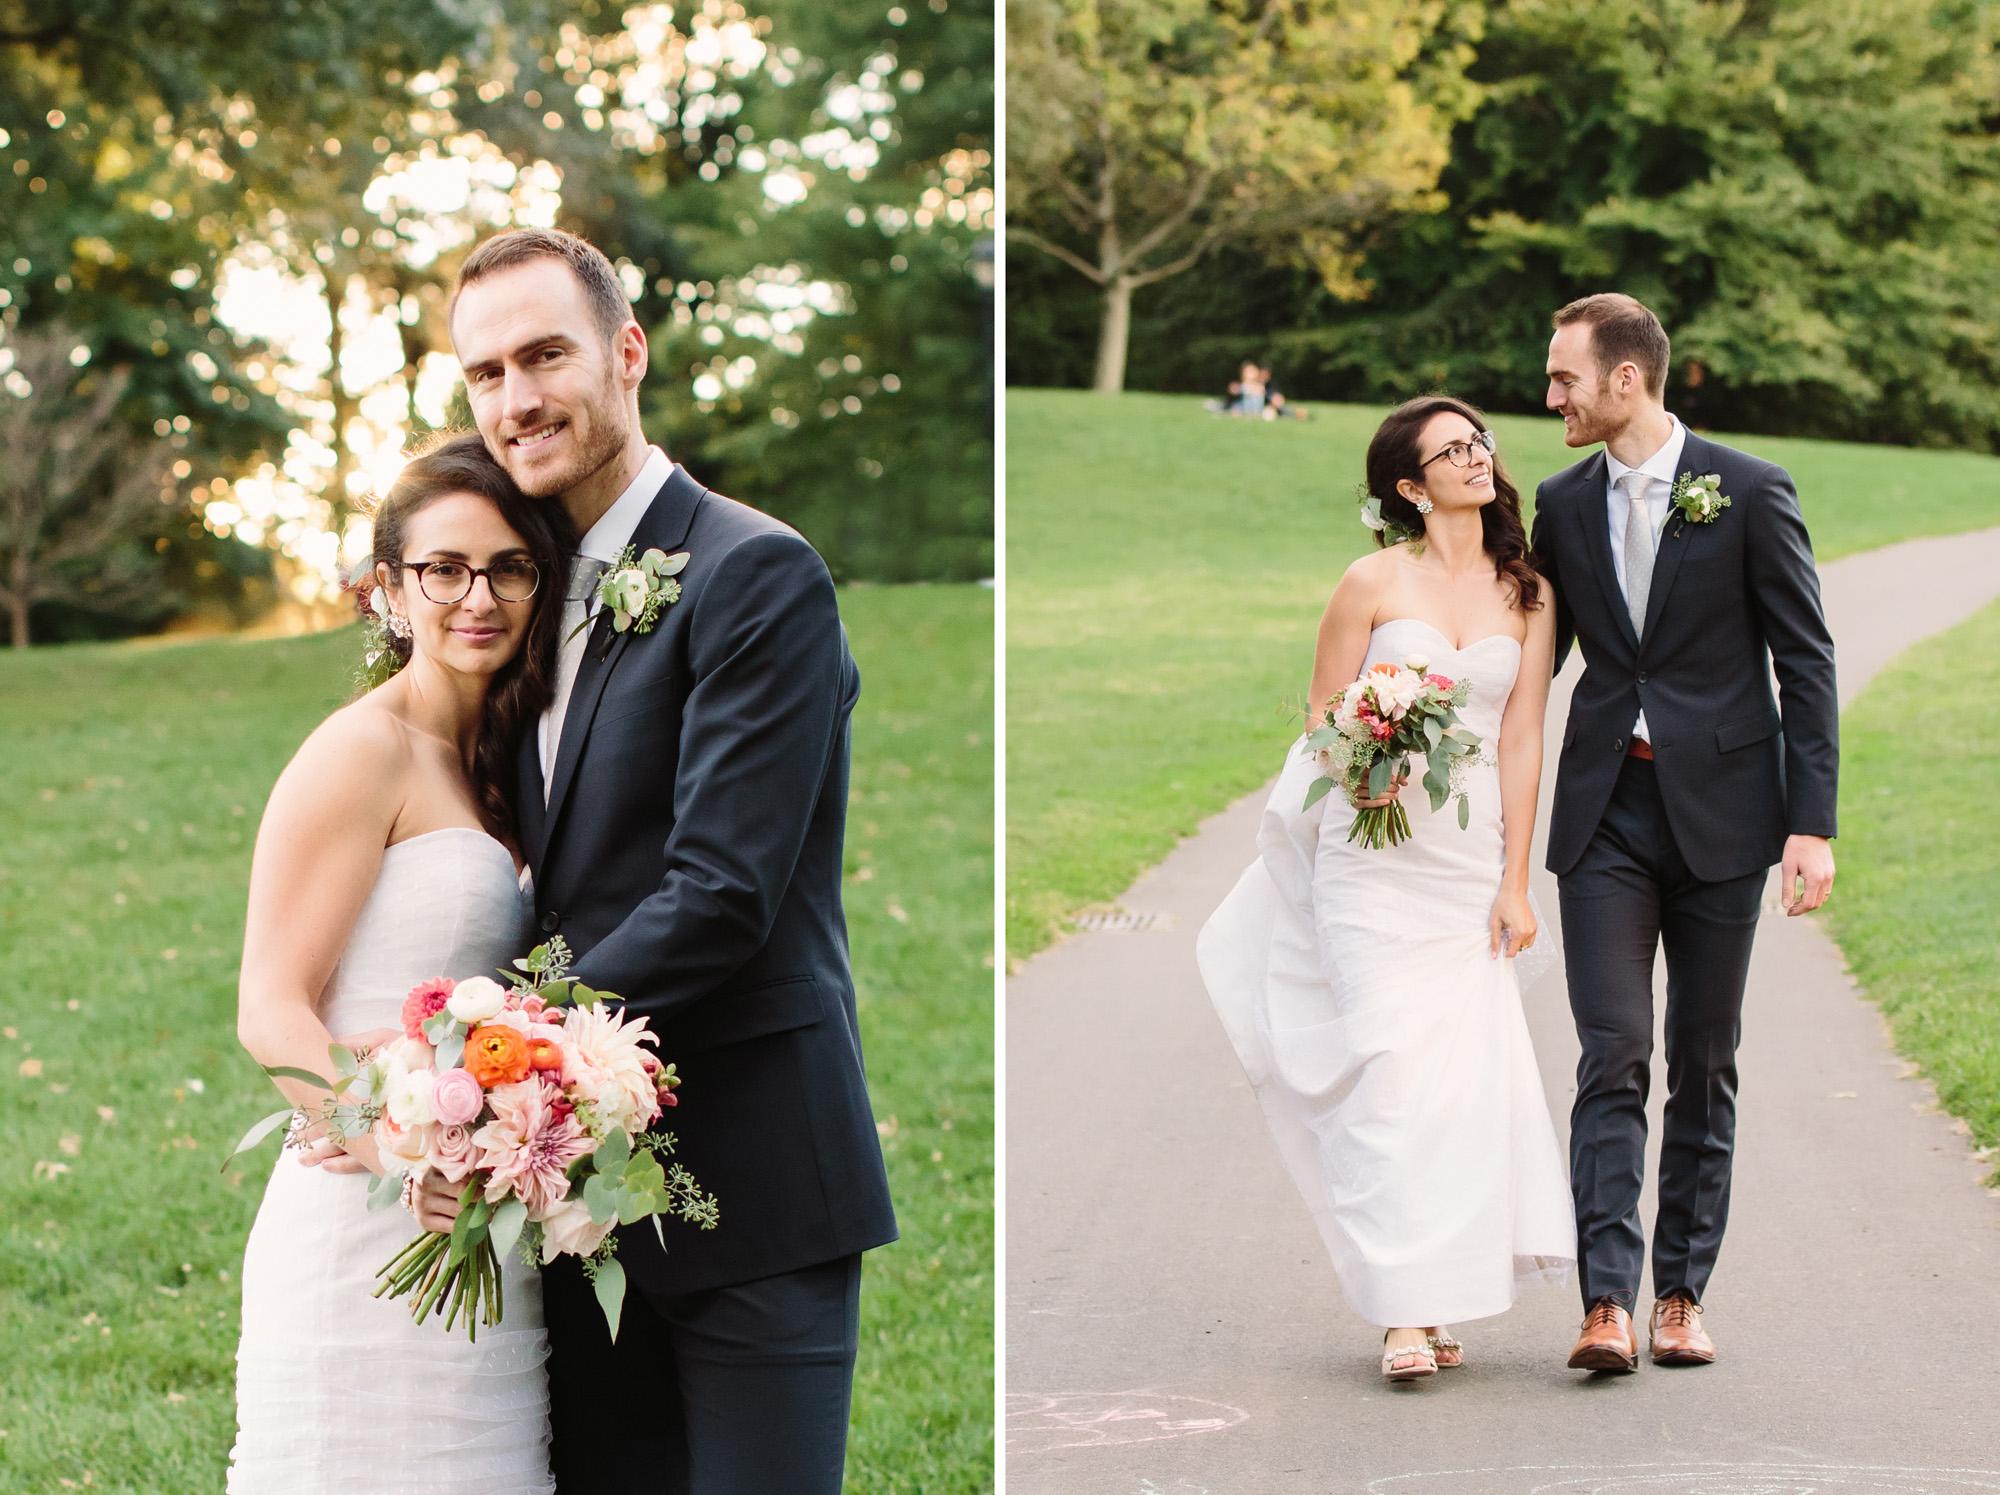 28_Kate_Sam_Picnic_House_Wedding_Brooklyn_NY_Tanya_Salazar_Photography.jpg